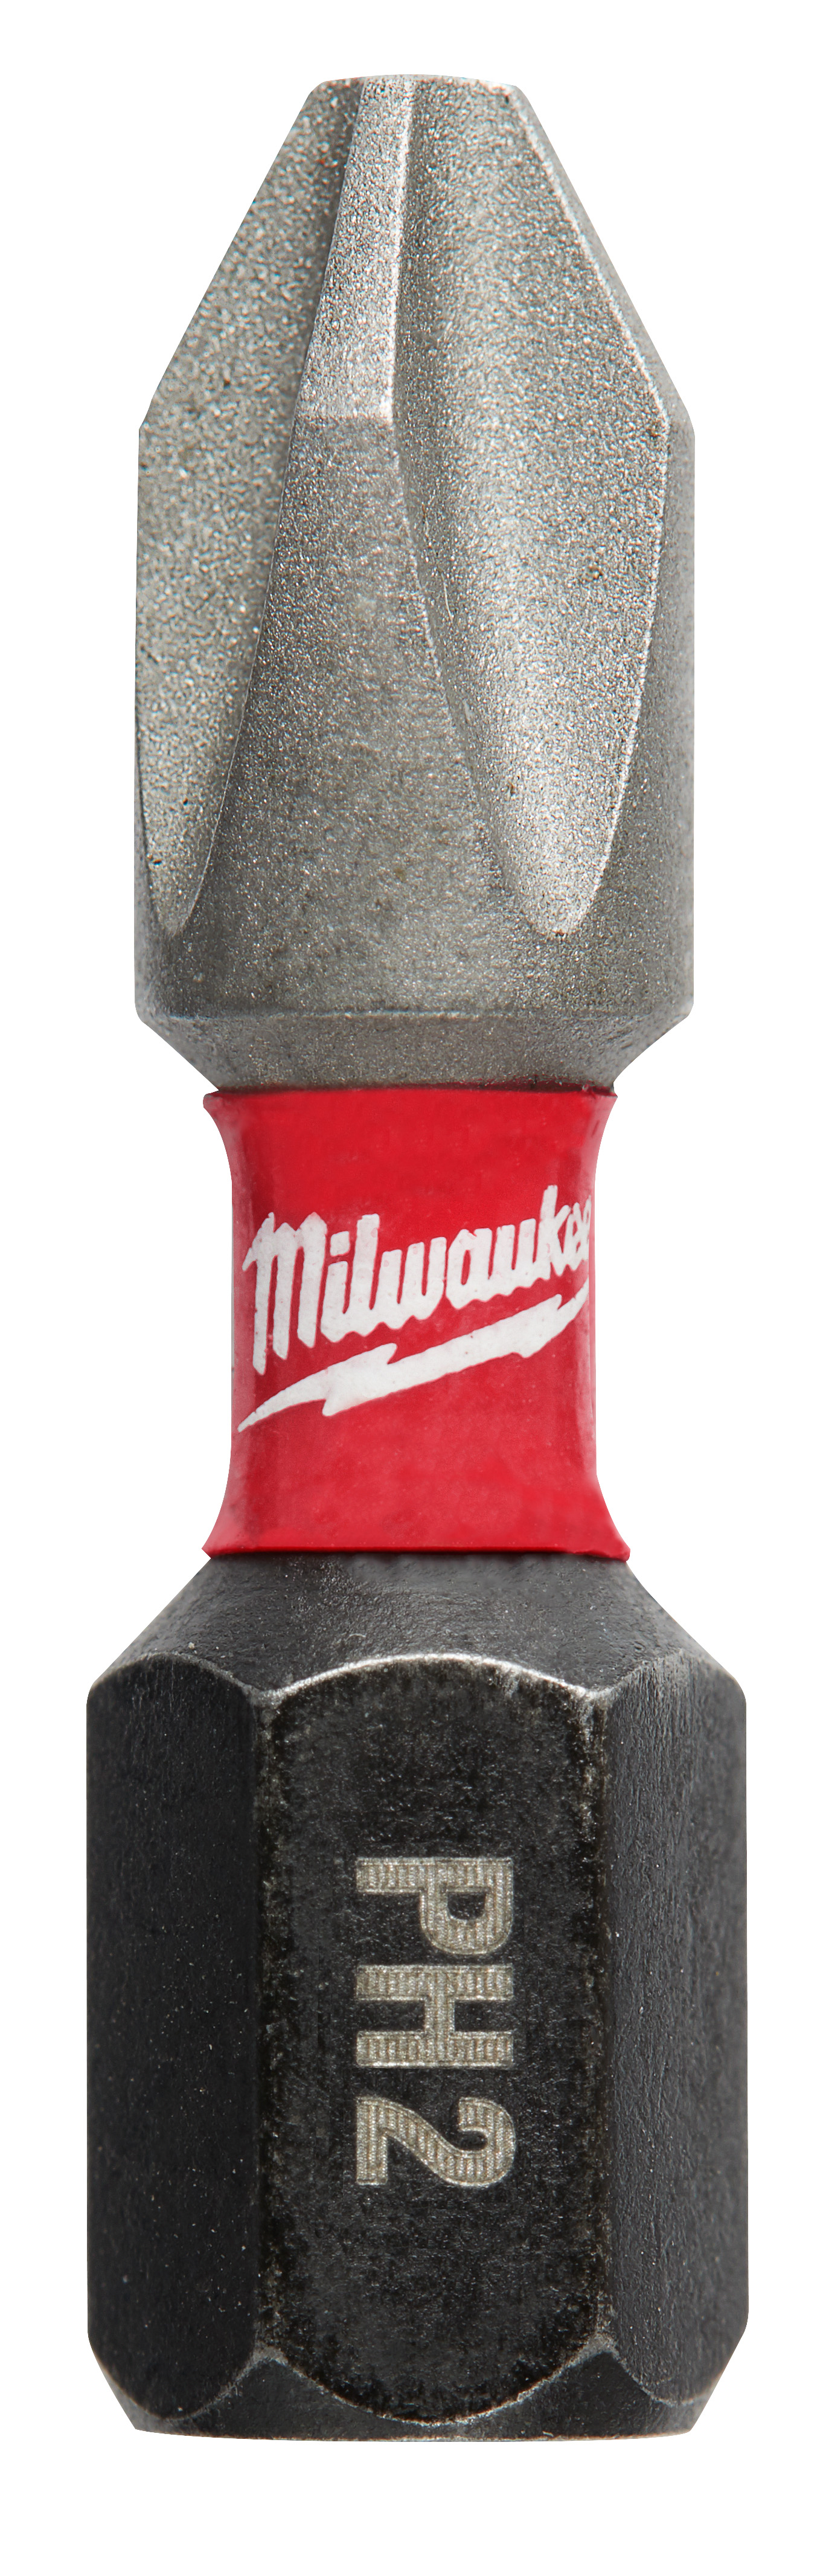 Milwaukee® SHOCKWAVE™ 48-32-4881 Impact Insert Bit, #2 Phillips® Point, 1/4 in, Steel